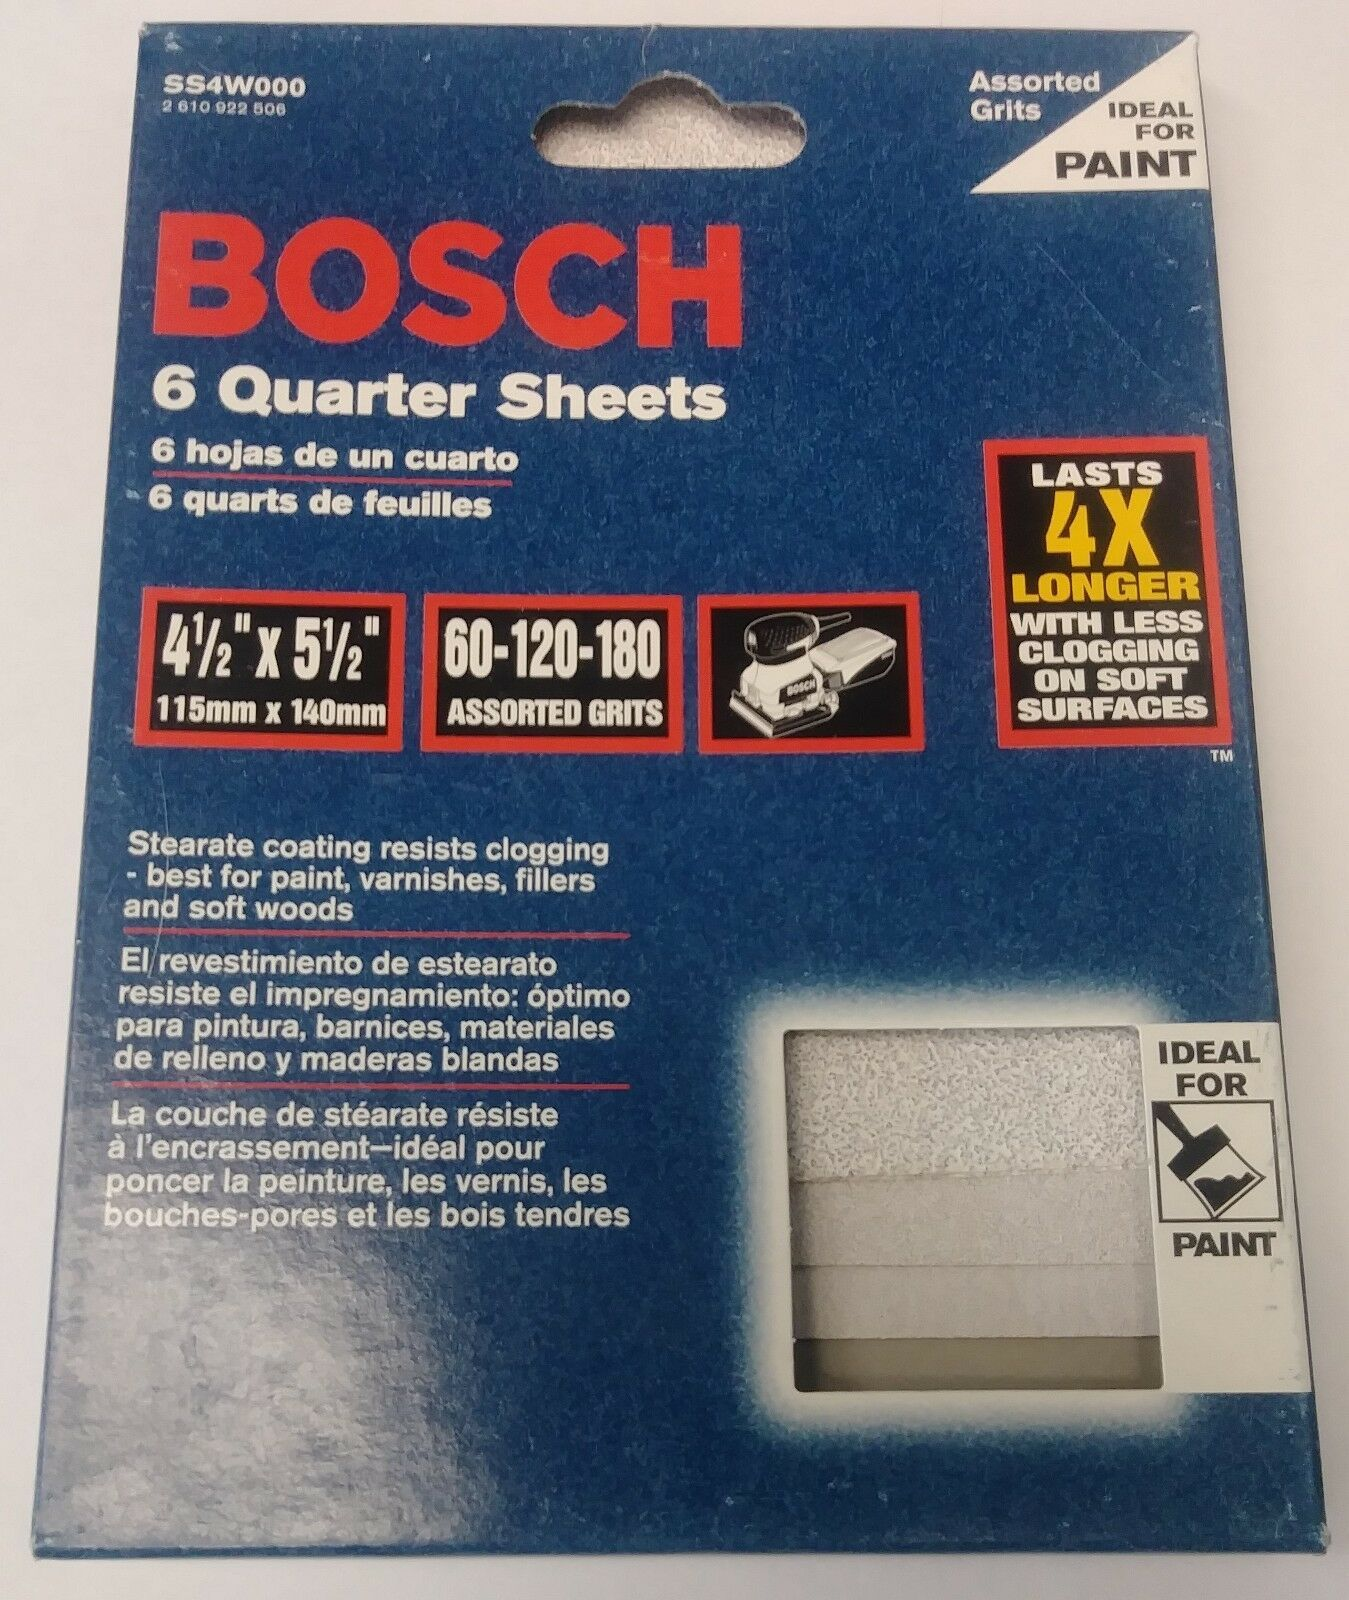 "Bosch SS4W000 60-120-180 Assorted Grits 4-1/2"" x 5-1/2"" Sanding Sheets (6 Discs) - $3.96"